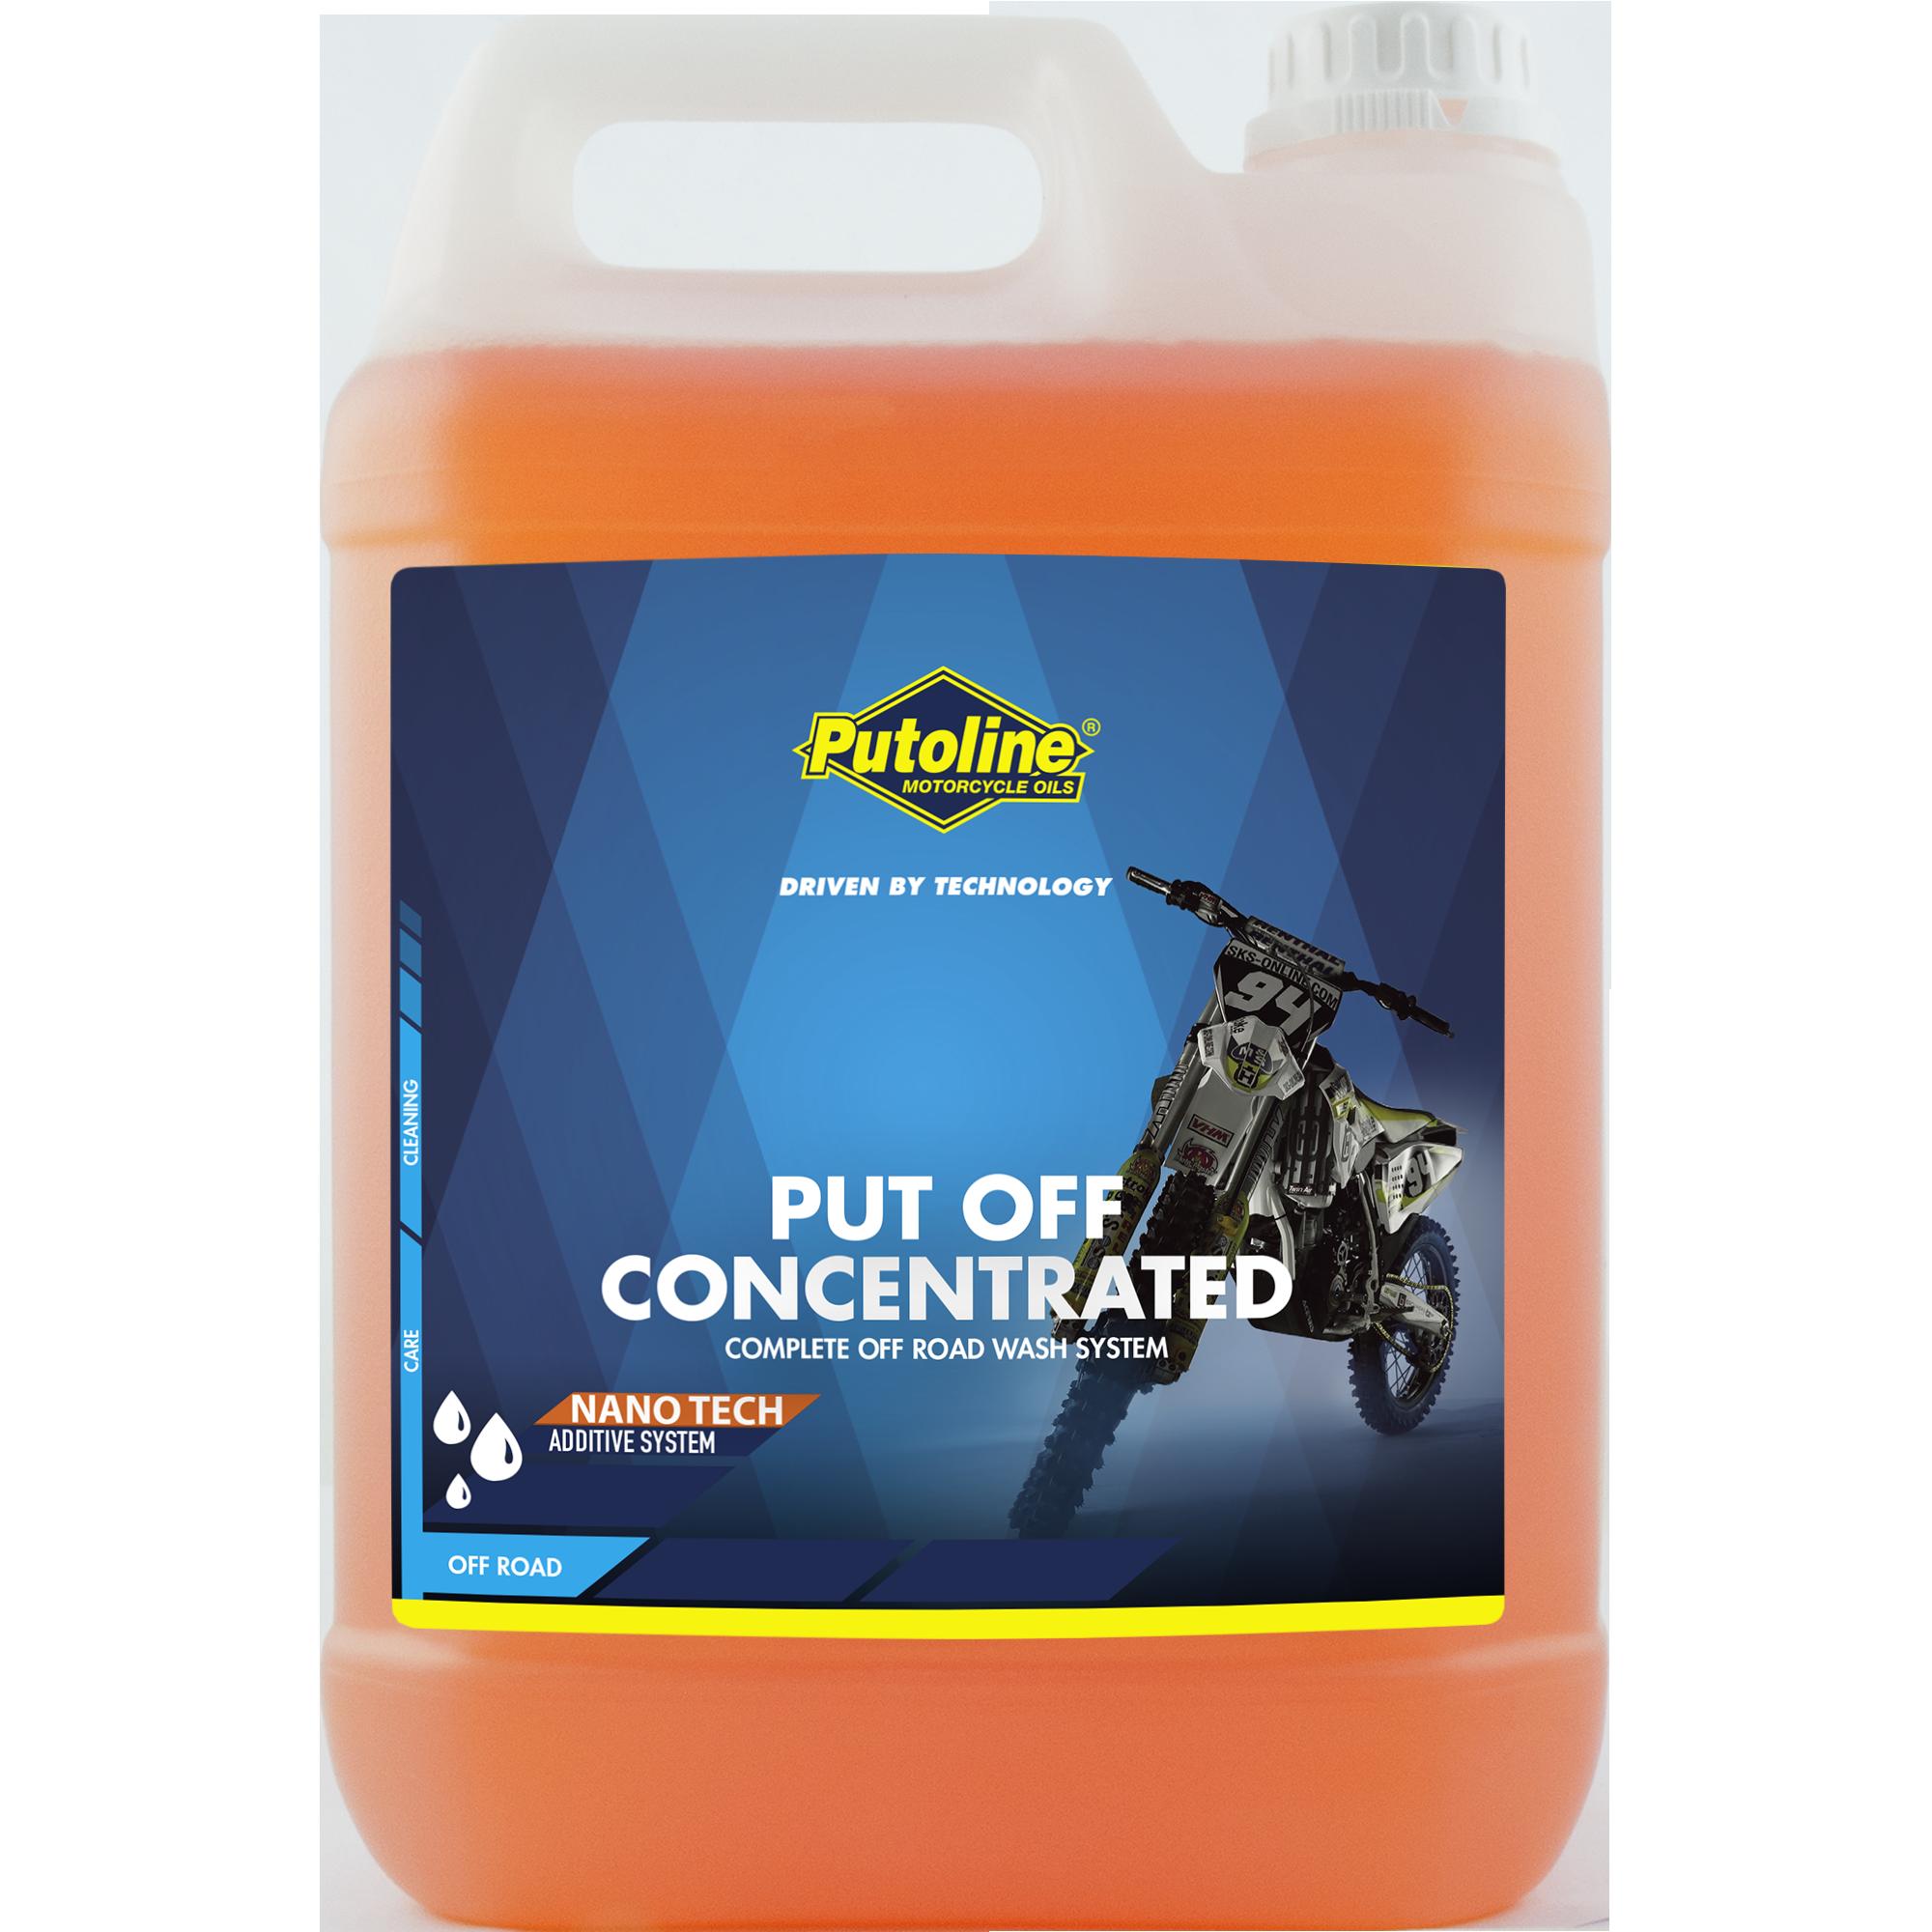 Putoline Put Off Concentrated 5L